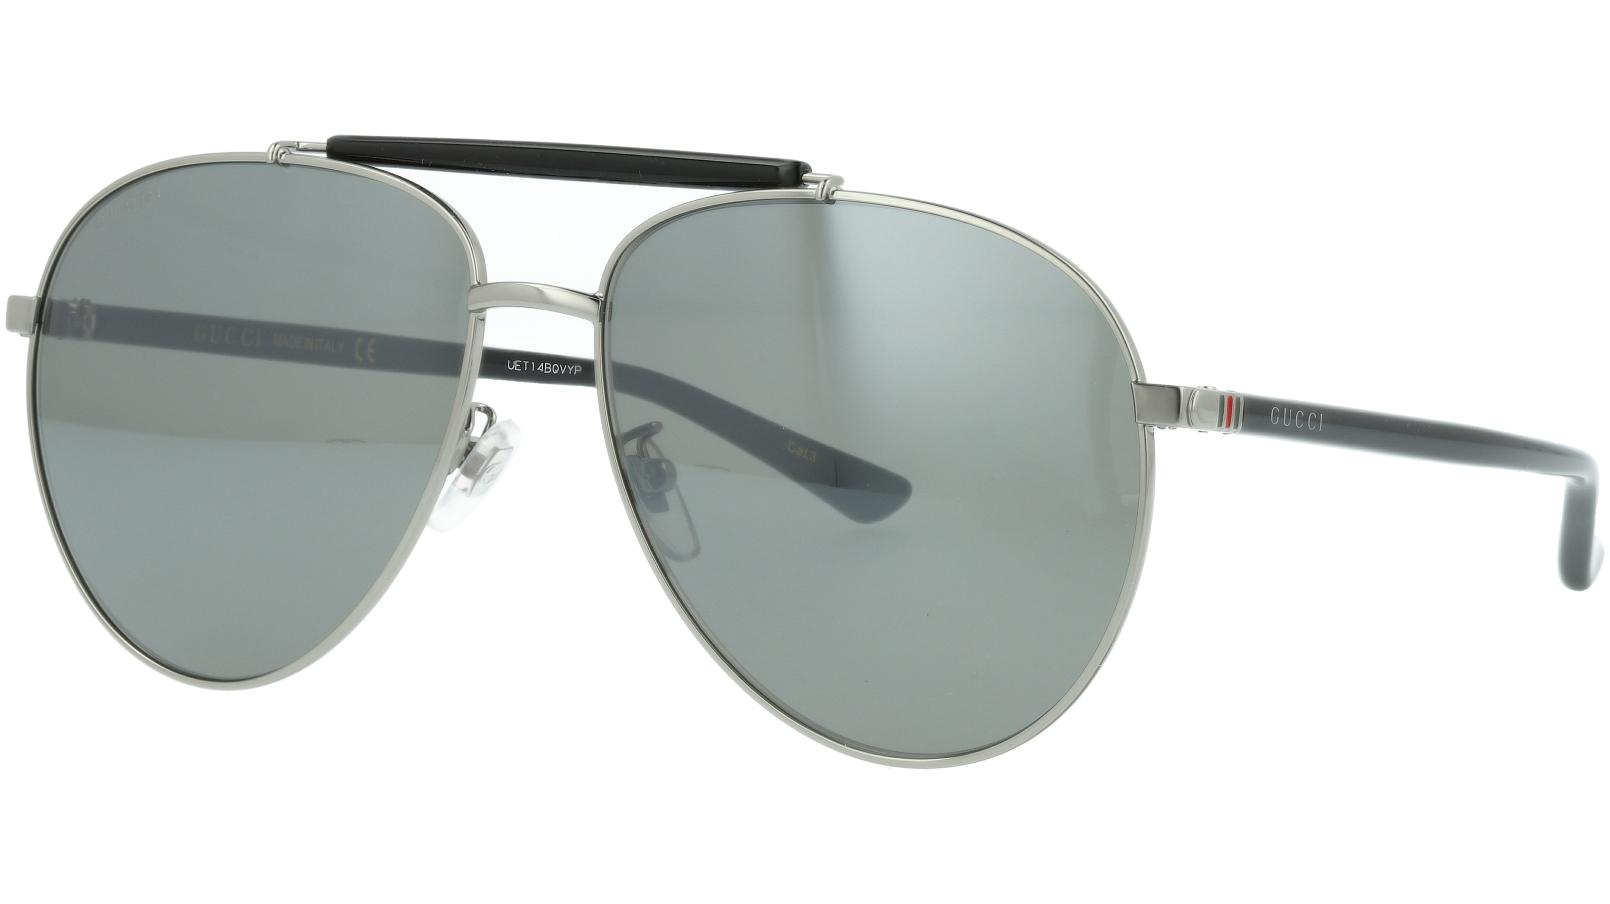 GUCCI GG0014S 001 60 RUTHENLUM Sunglasses